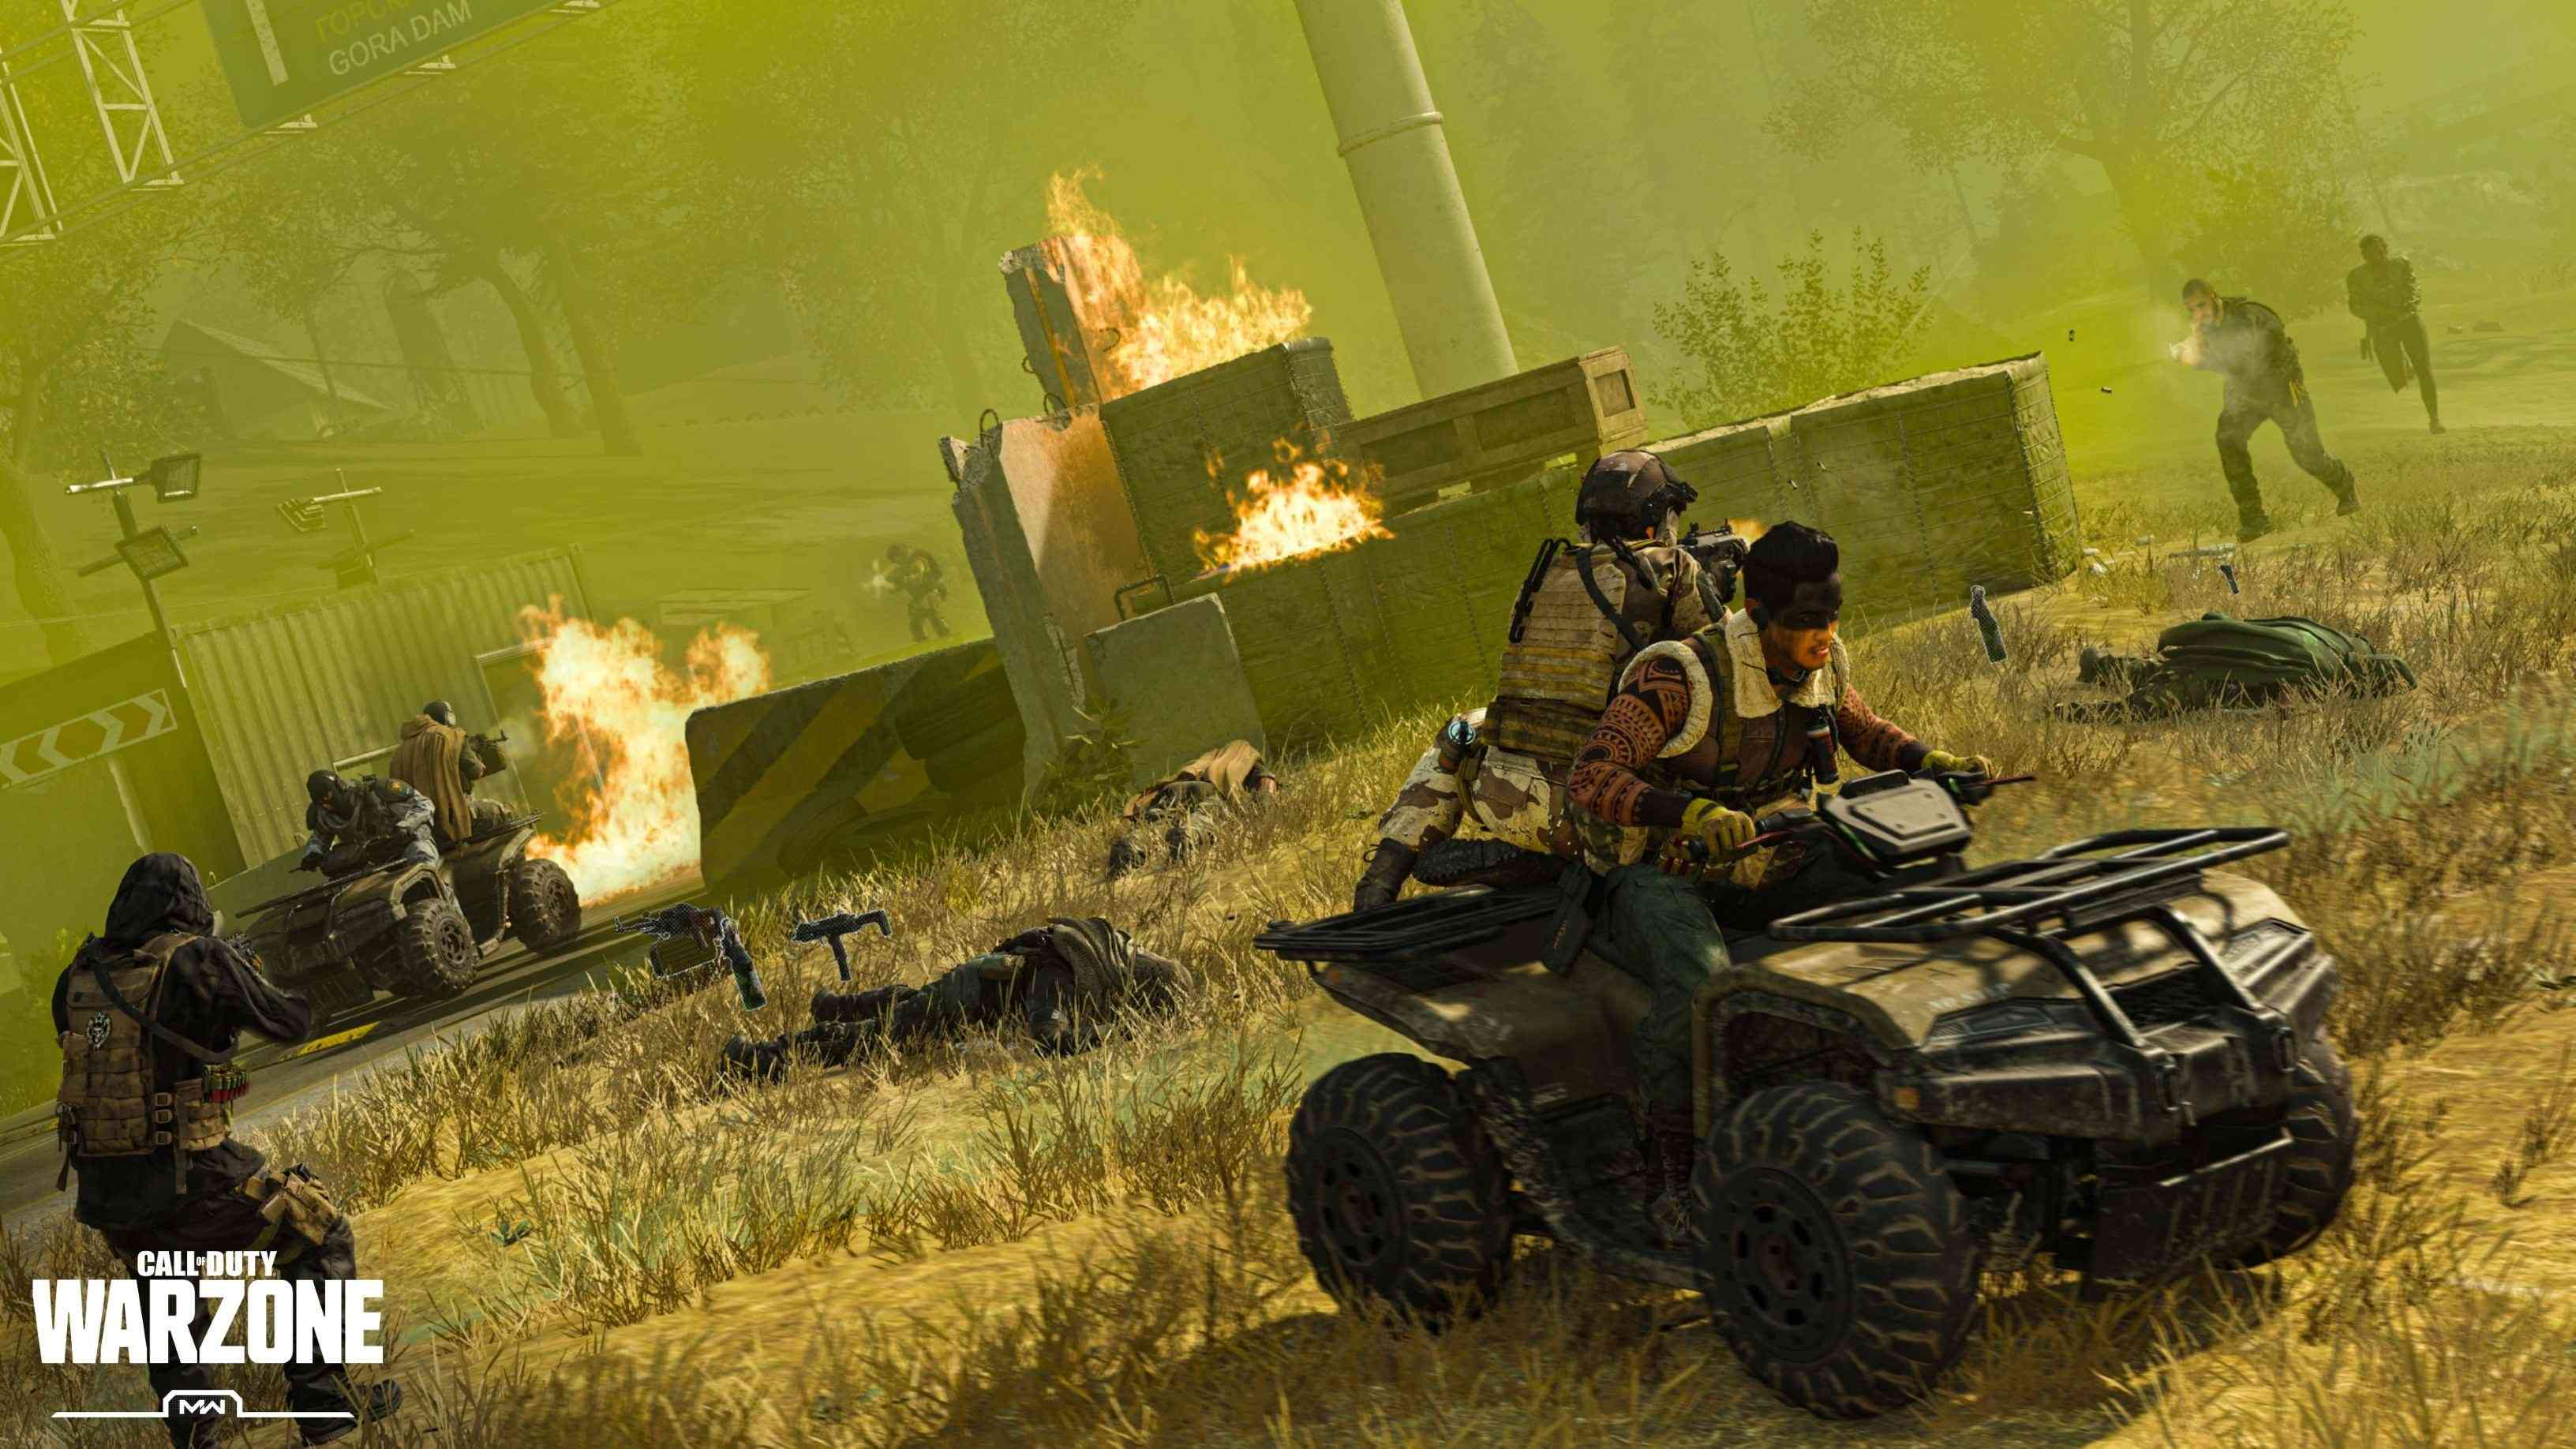 Call of Duty Warzone – Bild 4